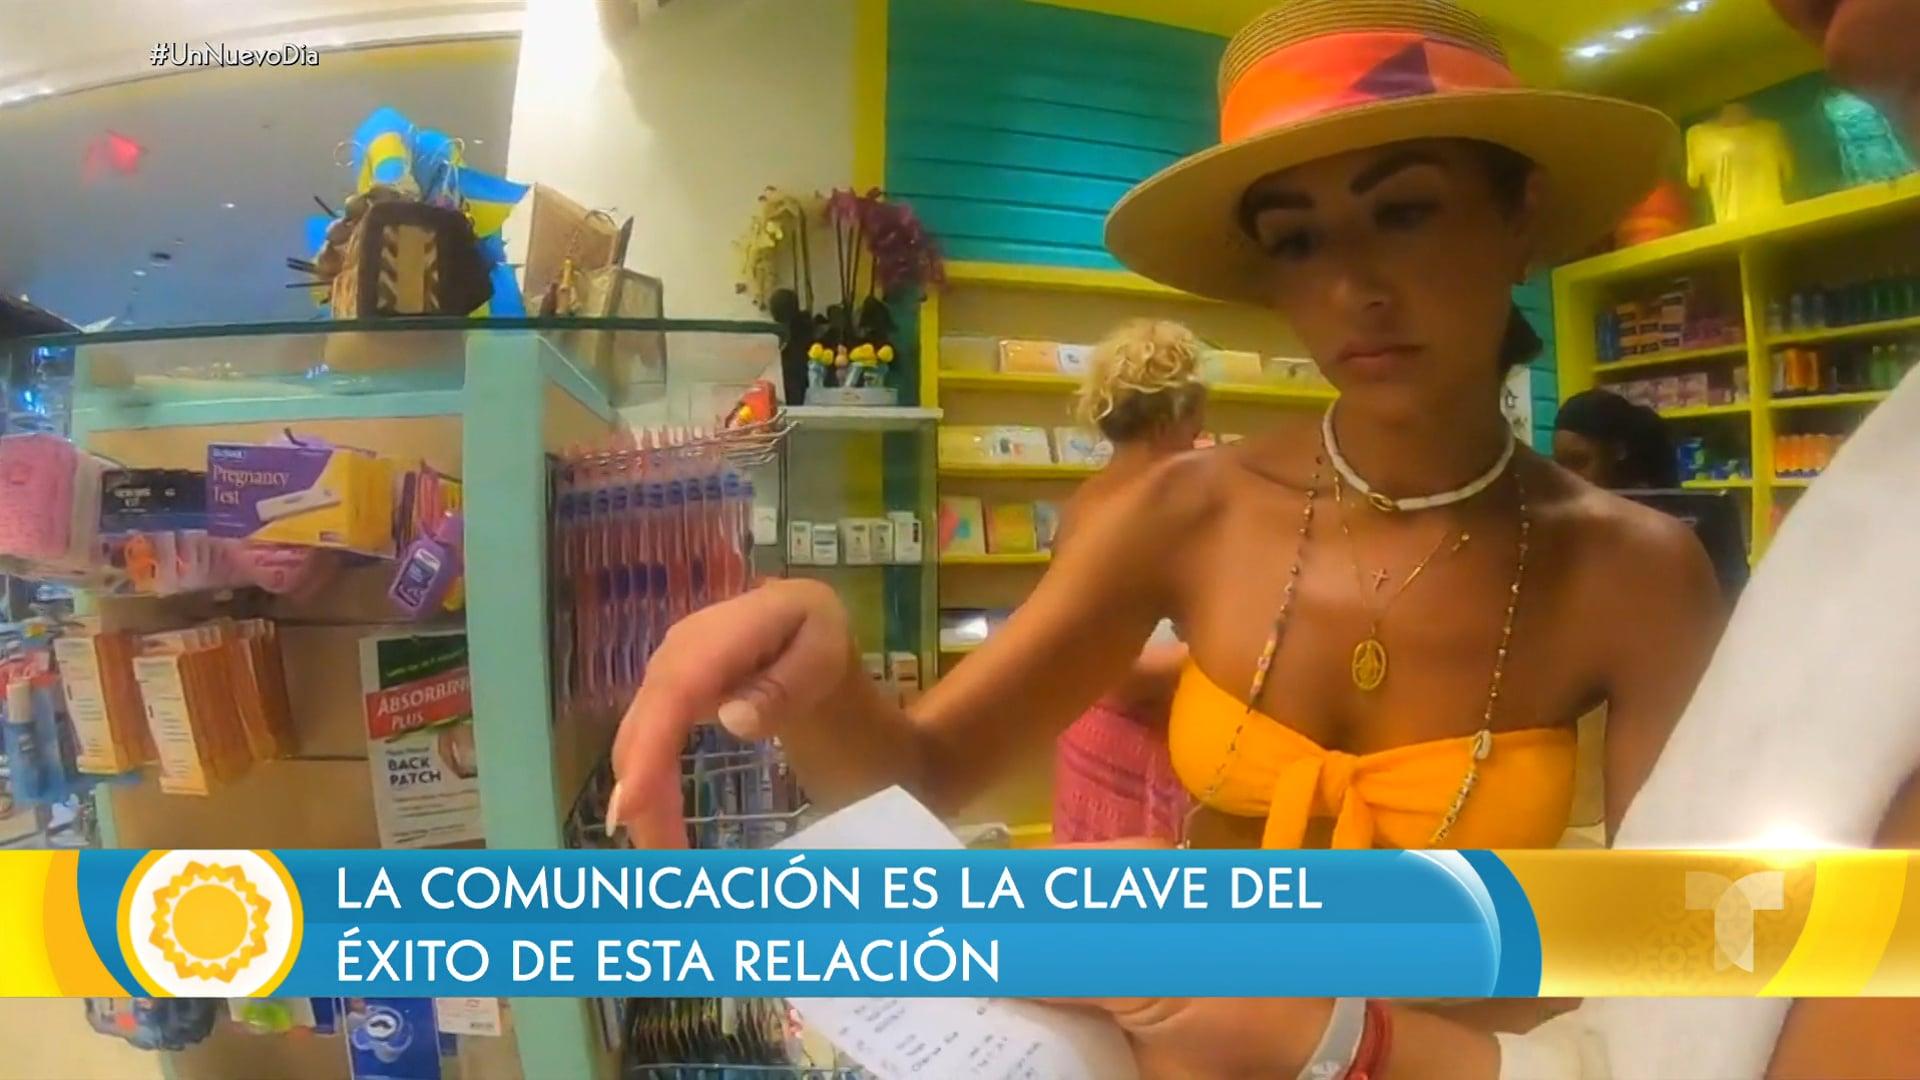 Jorge Bernal & Karla Birbragher - Spanish TV most loved couple